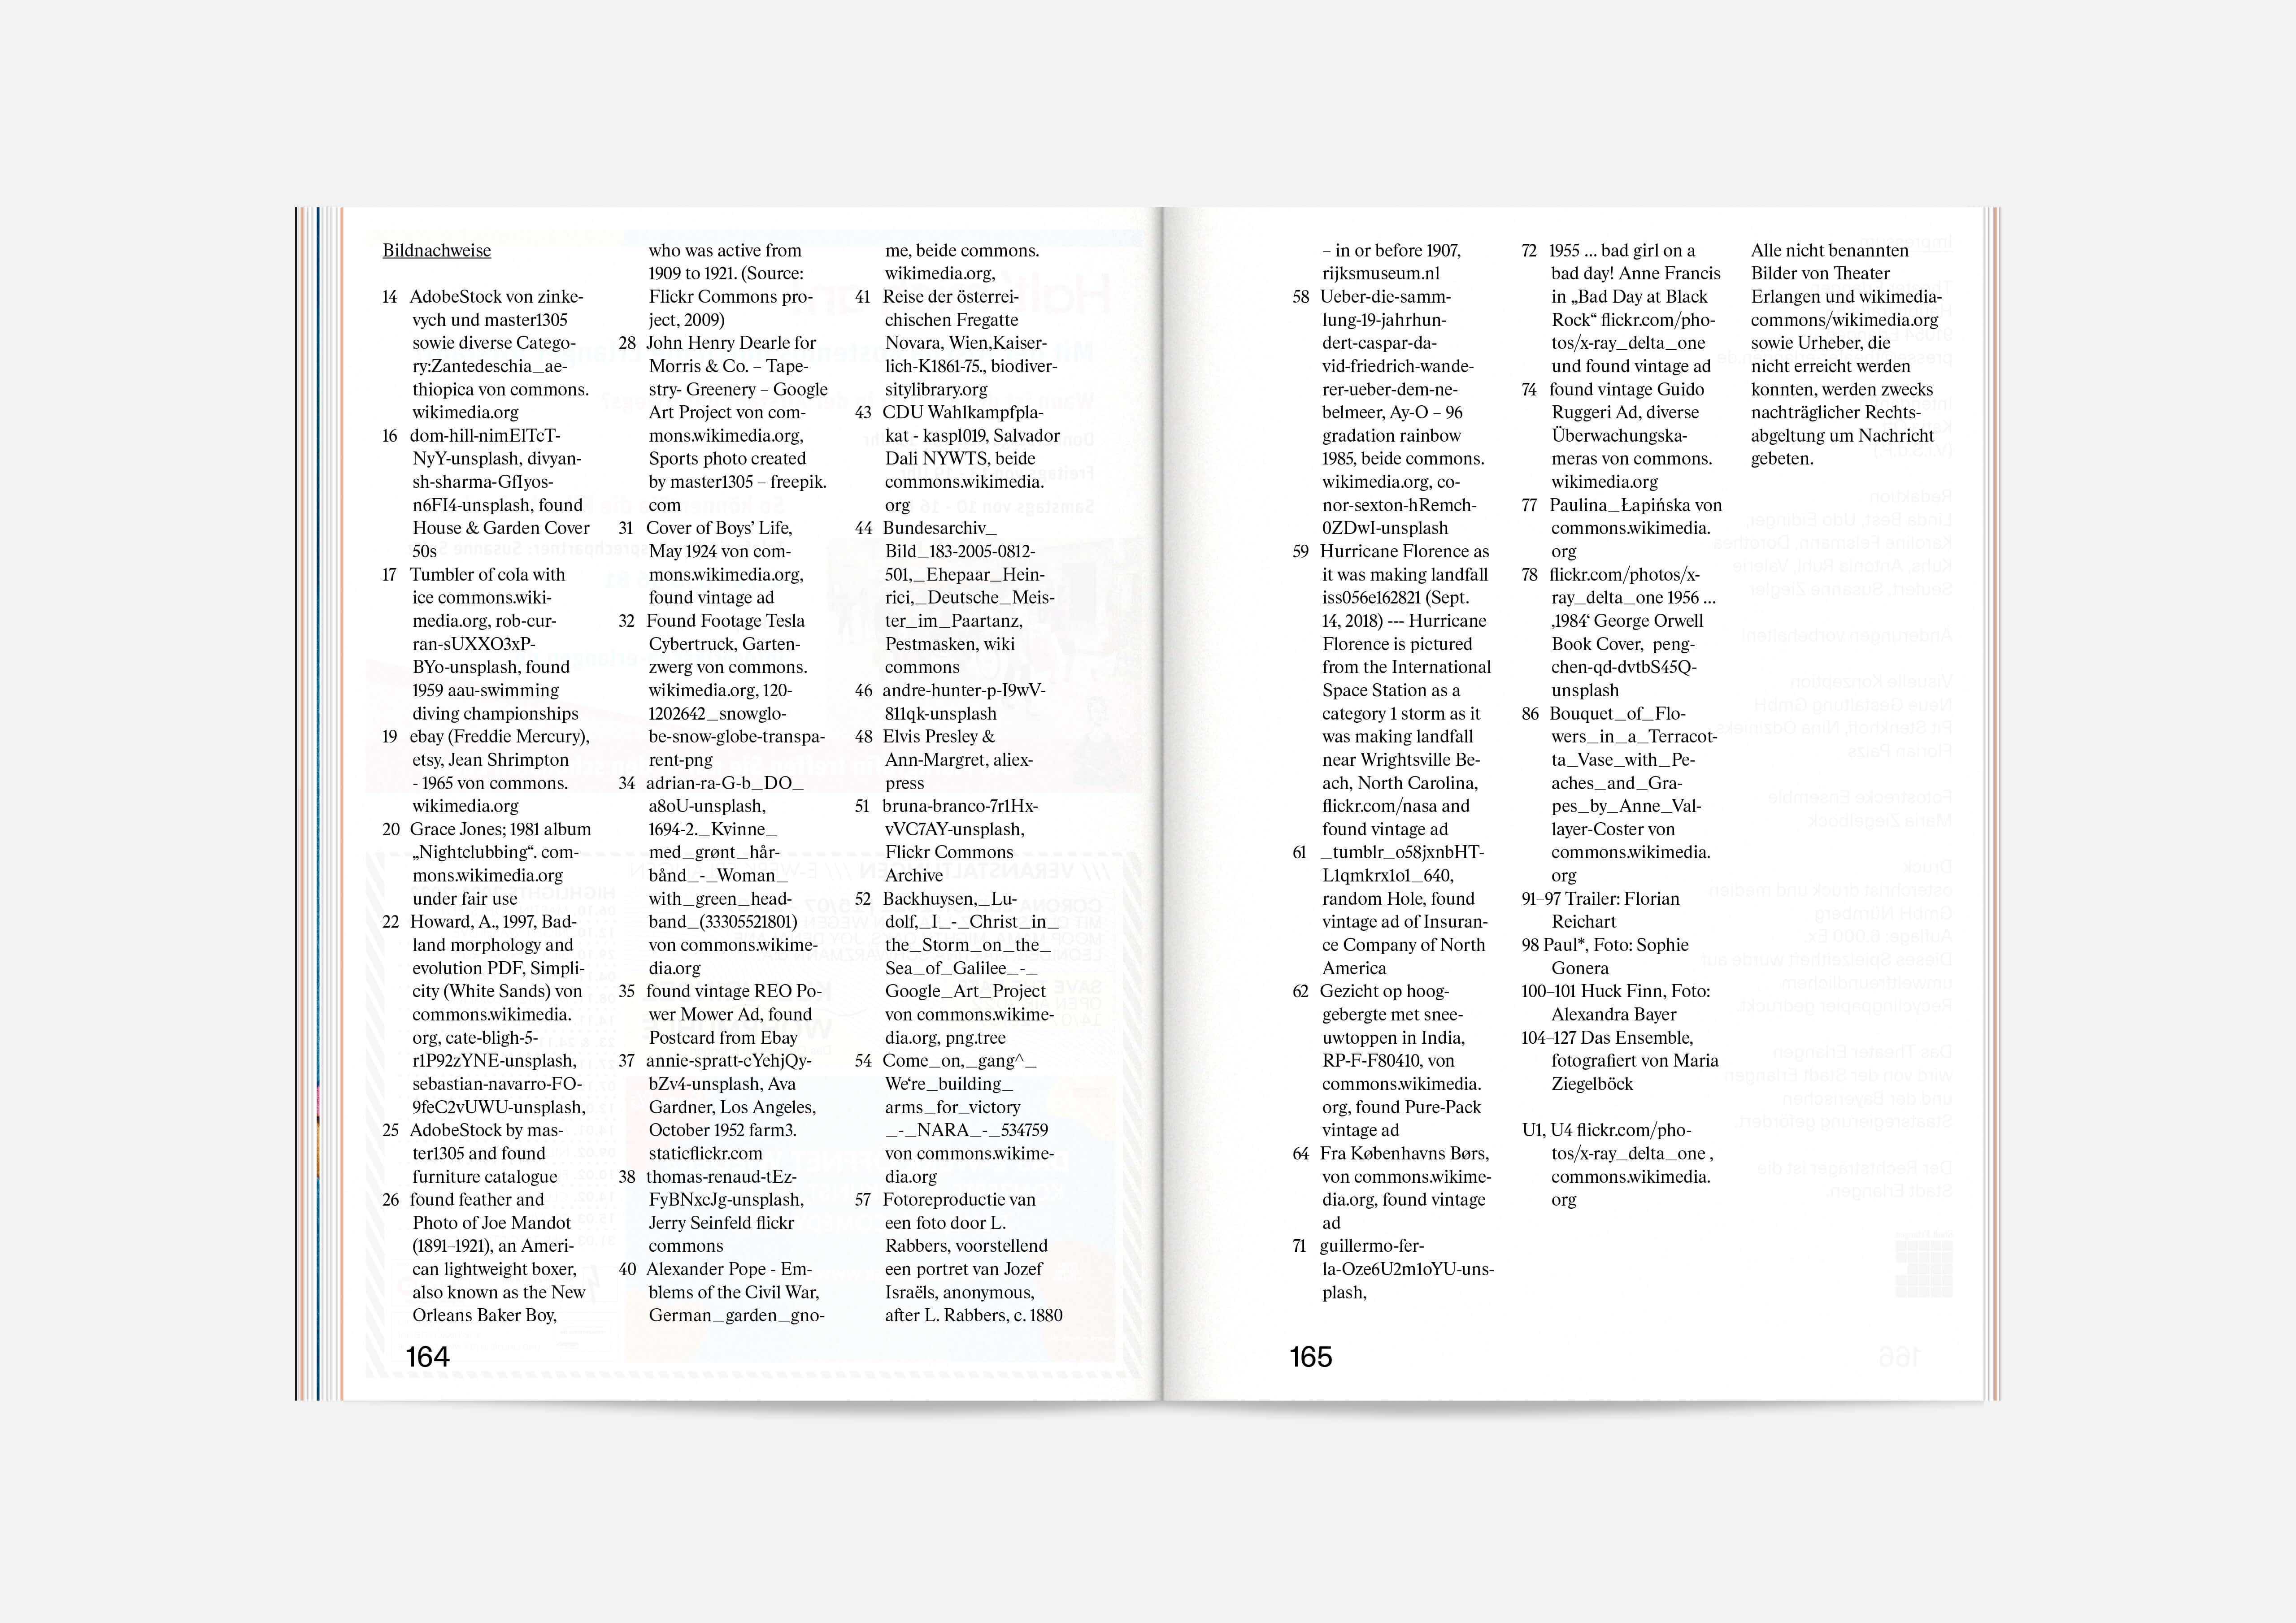 https://neuegestaltung.de/media/pages/clients/theater-erlangen-seasonal-program-2021-22/106206643f-1630497302/te-szh-202122_35.jpg